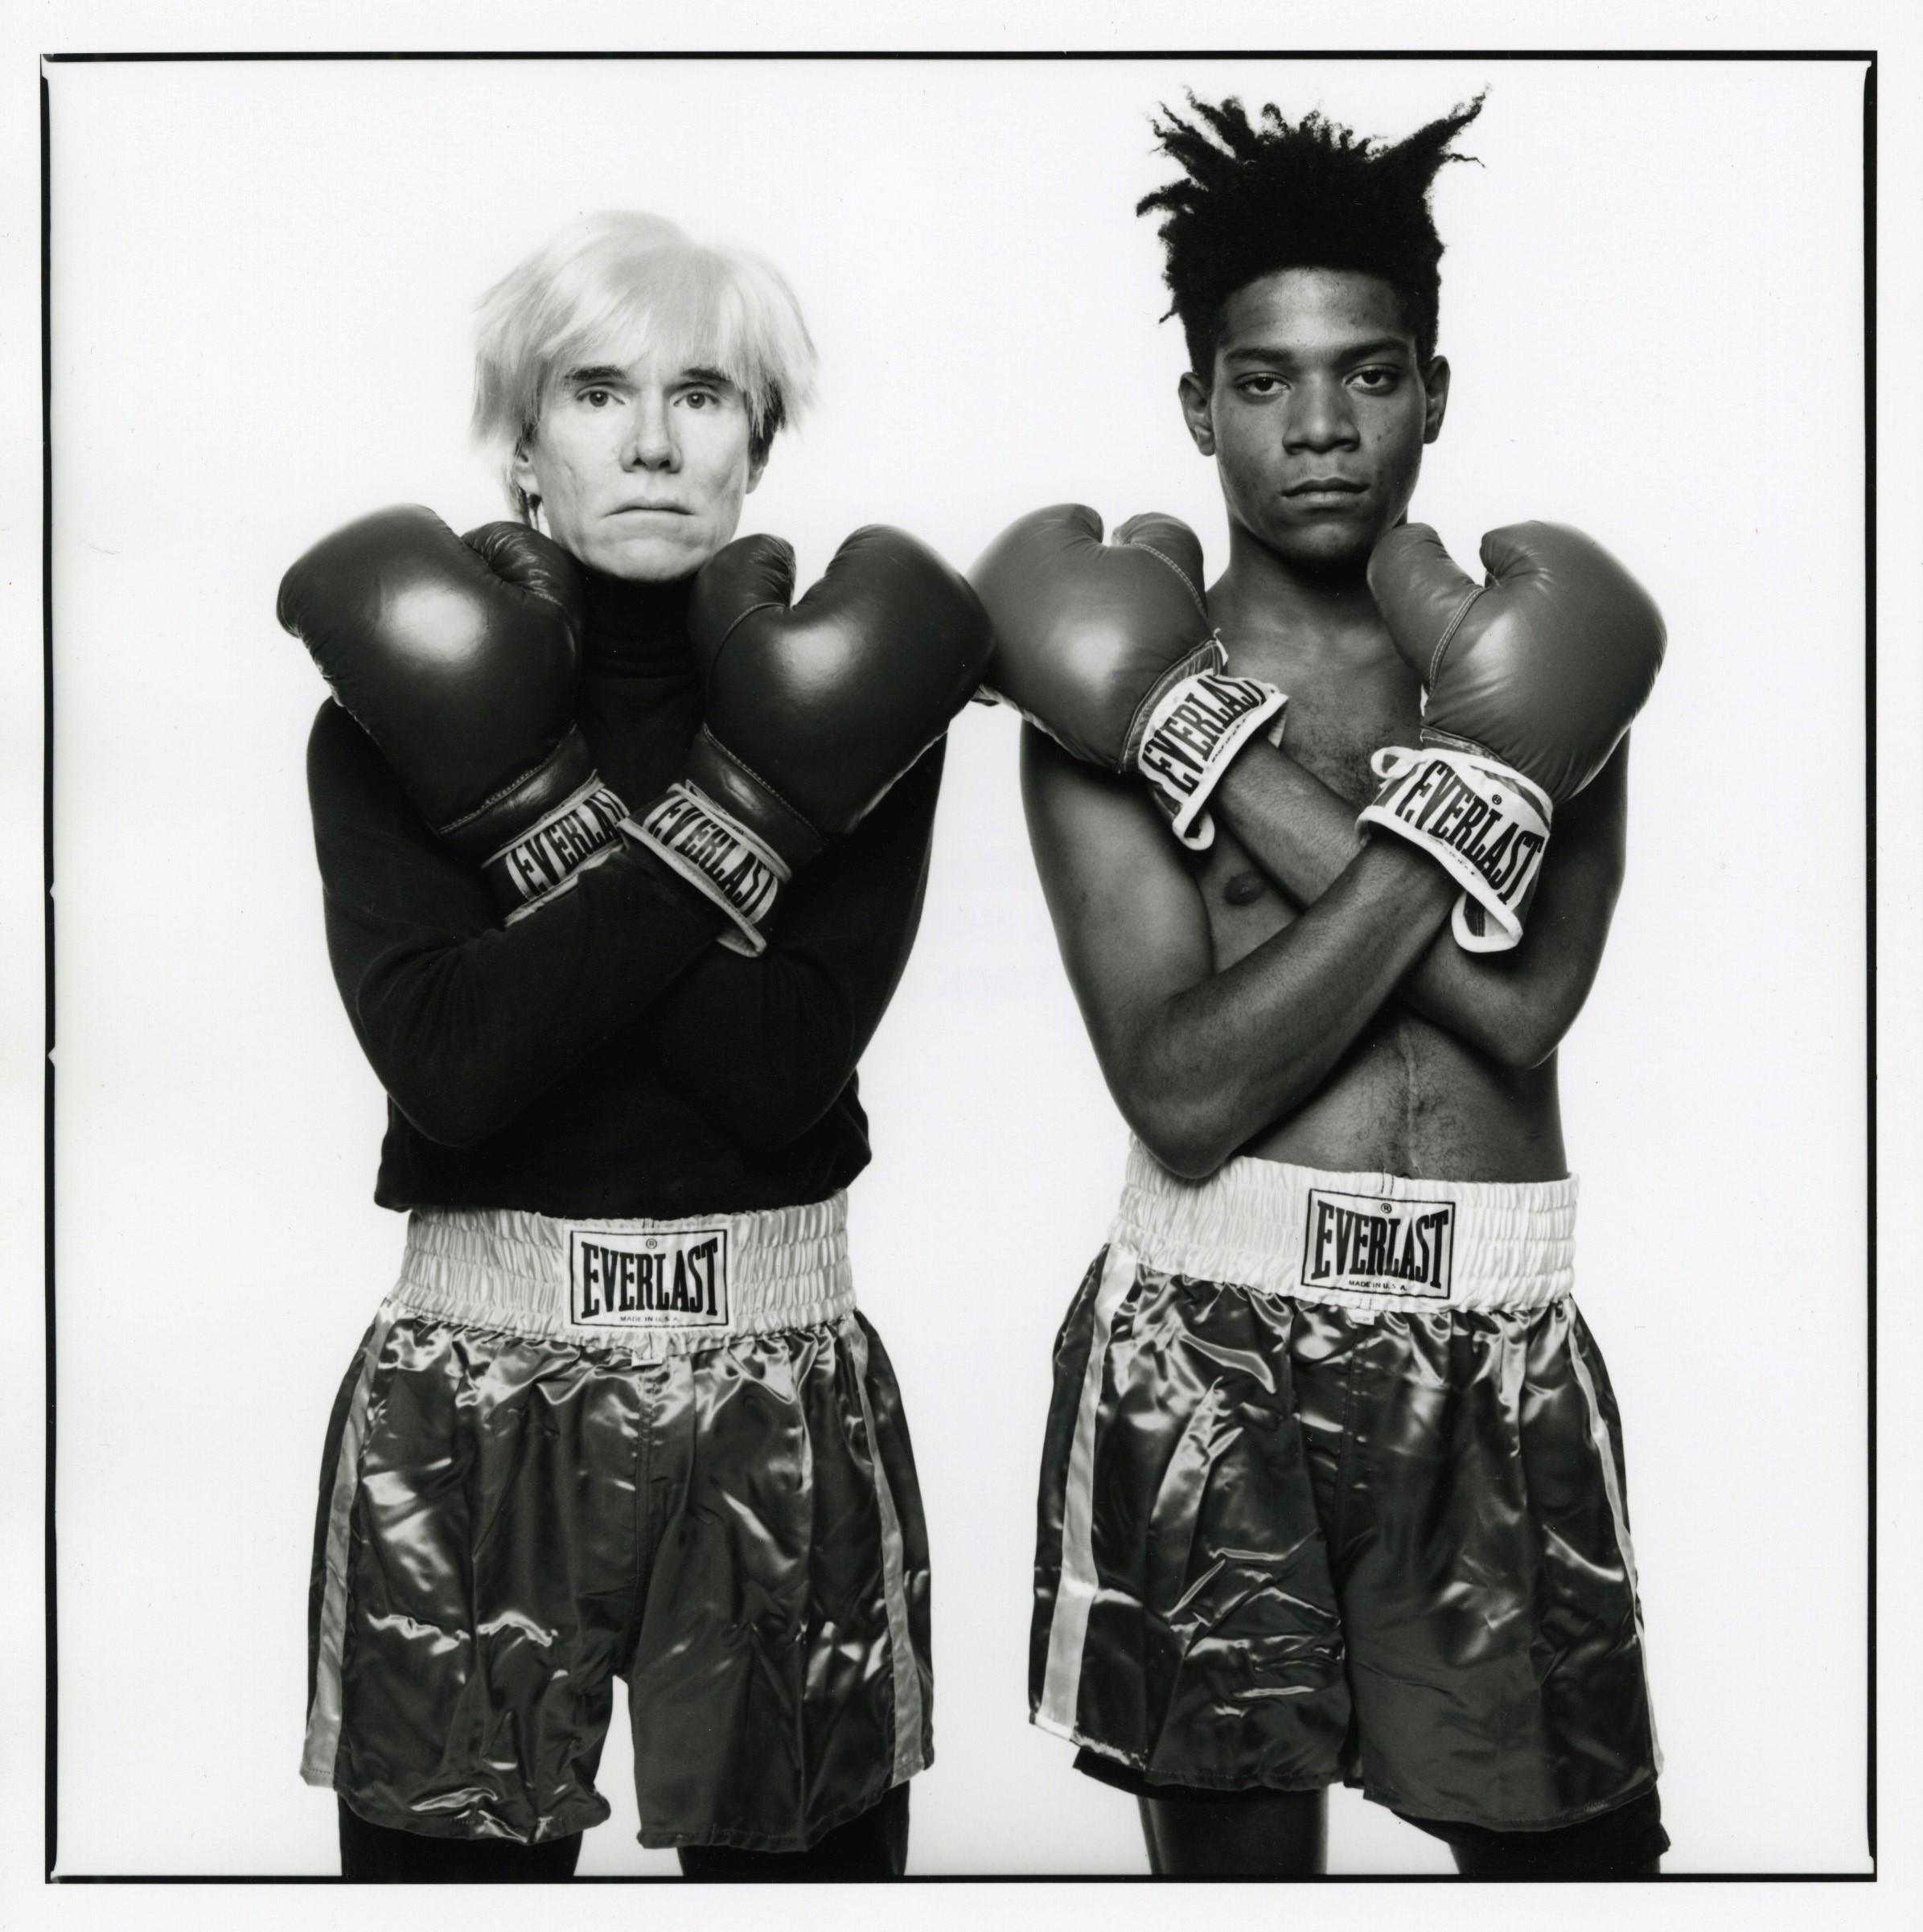 Andy Warhol e Jean-Michel Basquiat  (Foto: Michael Halsband / Divulgação)